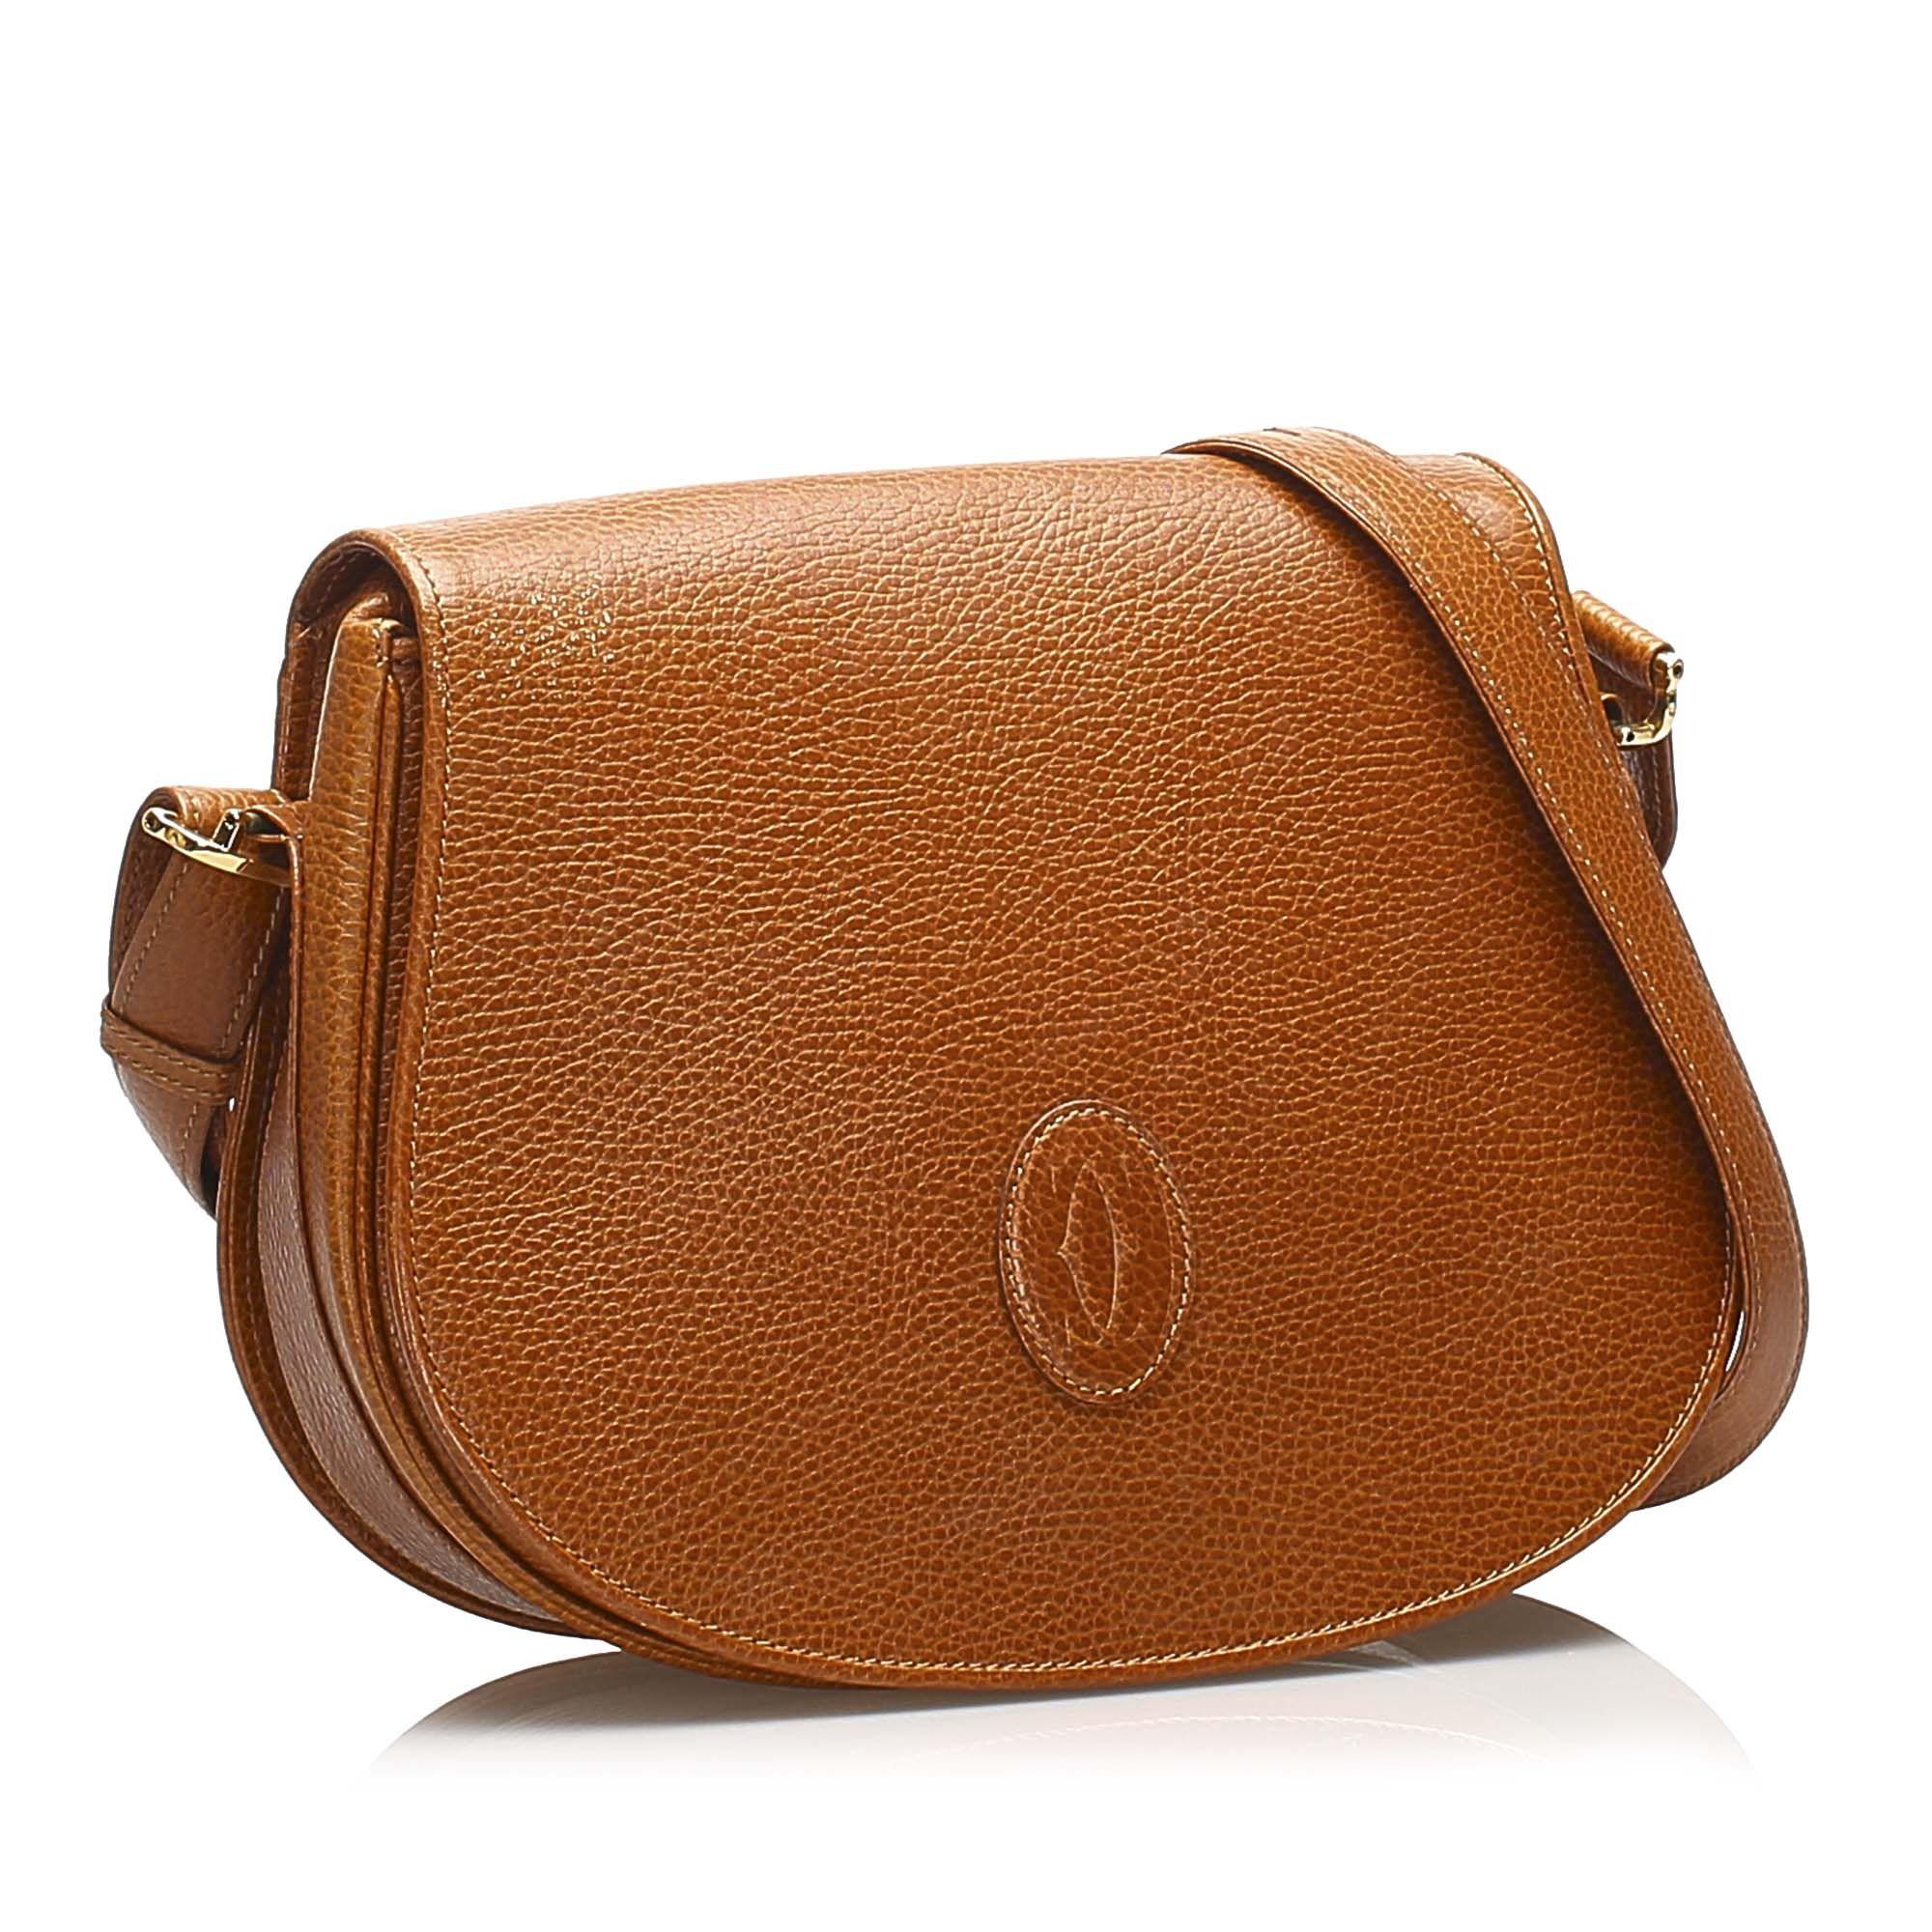 Vintage Cartier Must de Cartier Leather Shoulder Bag Brown